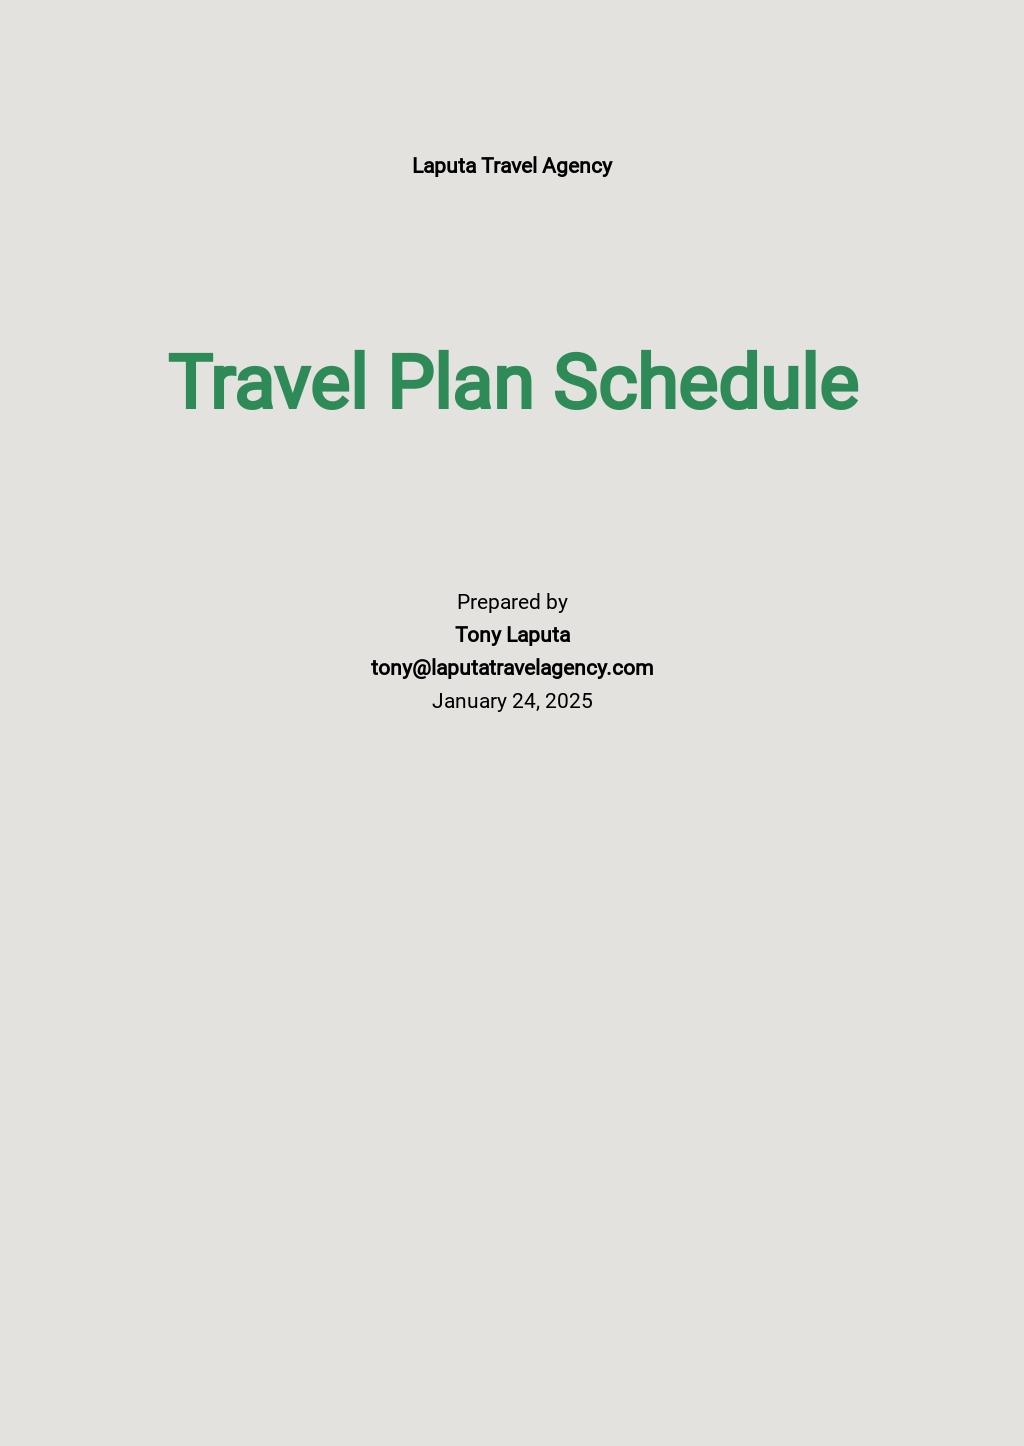 Travel Plan Schedule Template